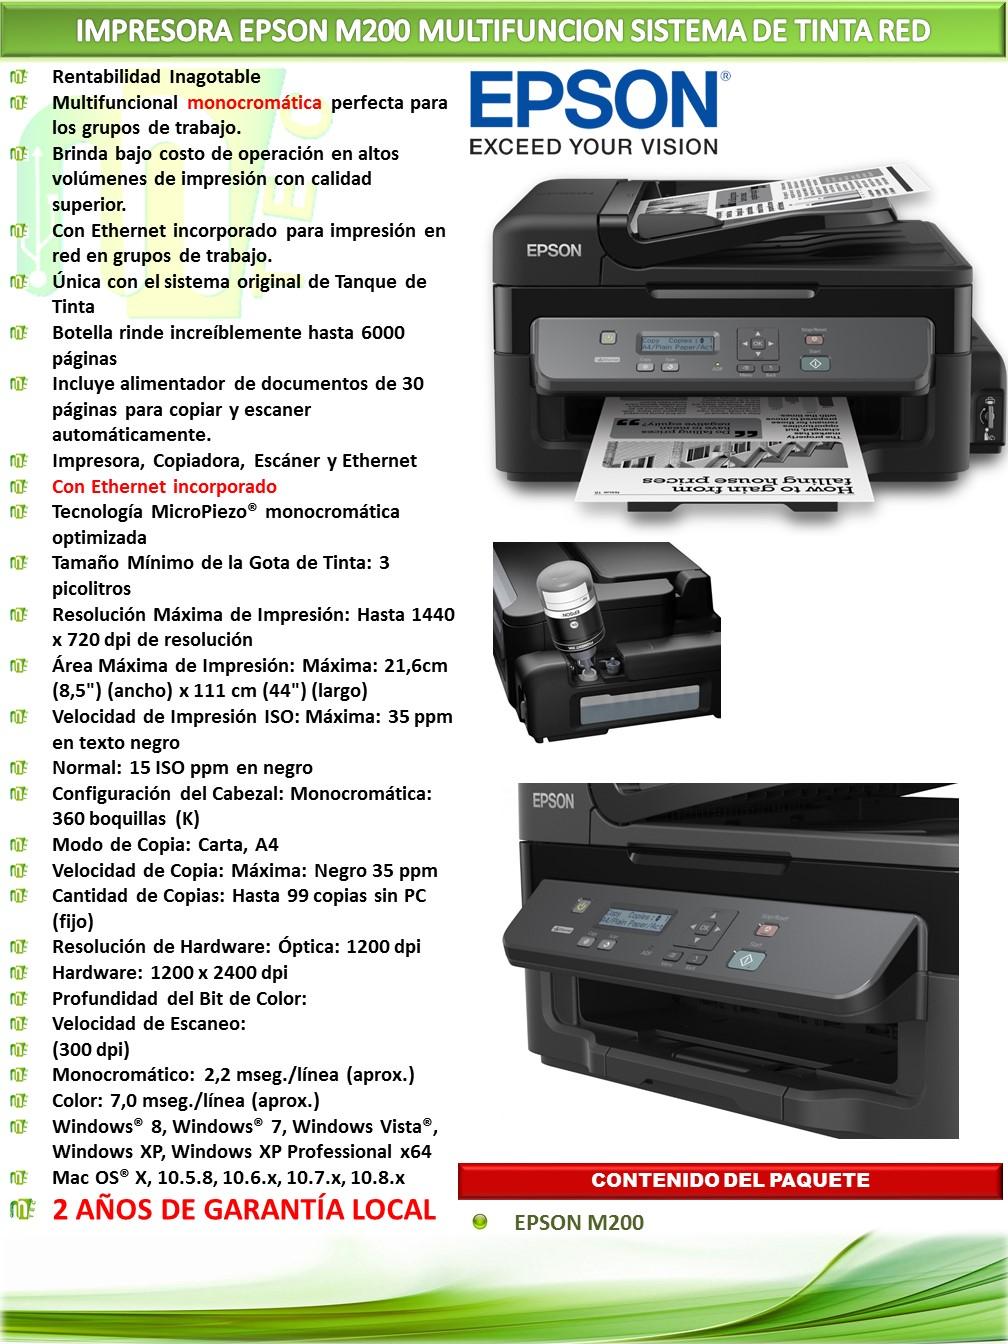 Impresora Epson Workforce M200 Mtec